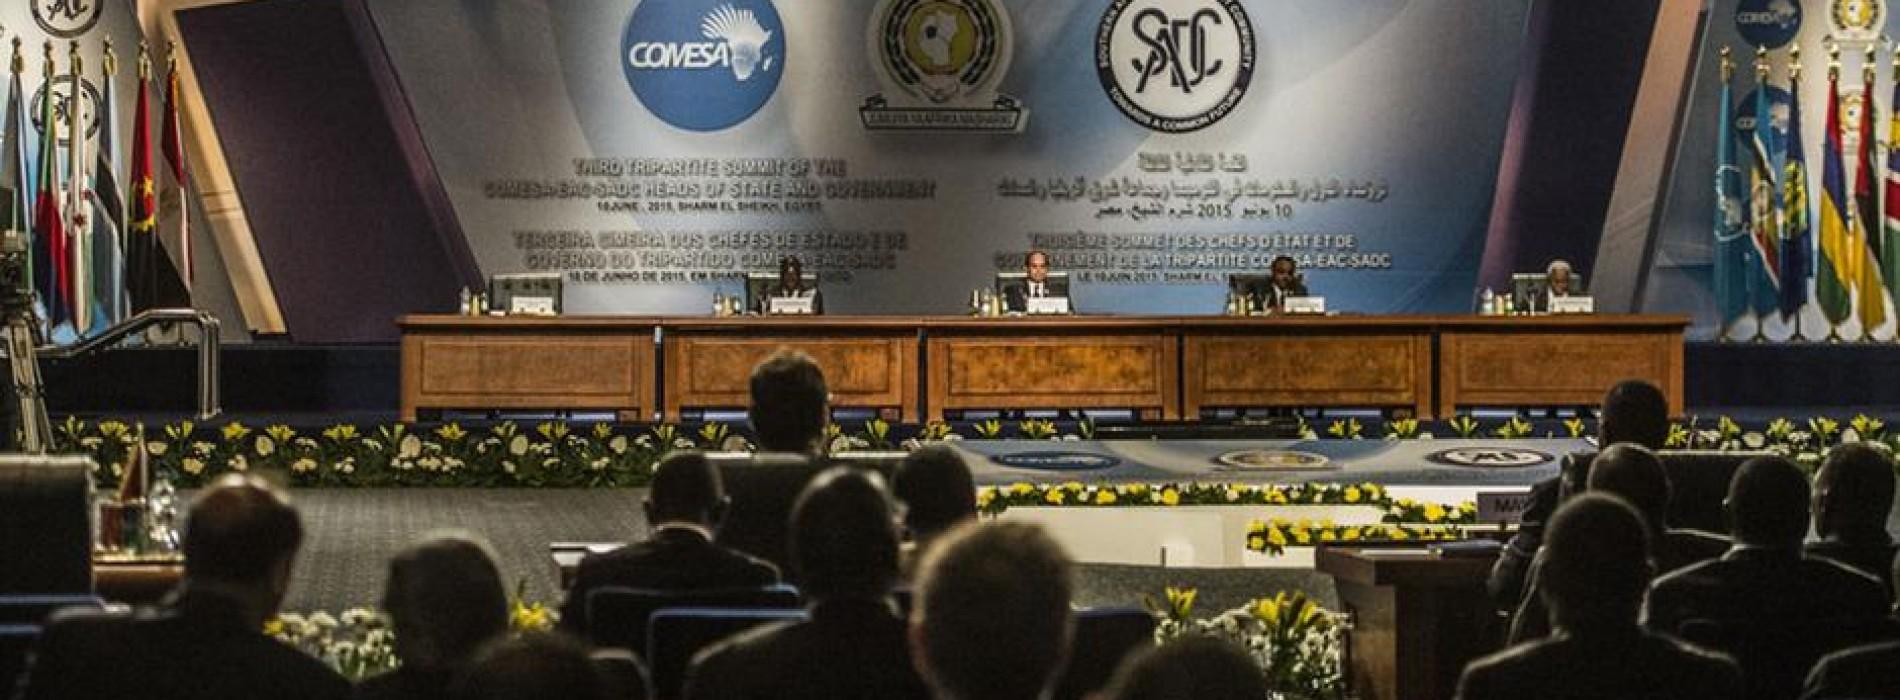 Africa: L'accordo Tripartite Free Trade Area (TFTA)